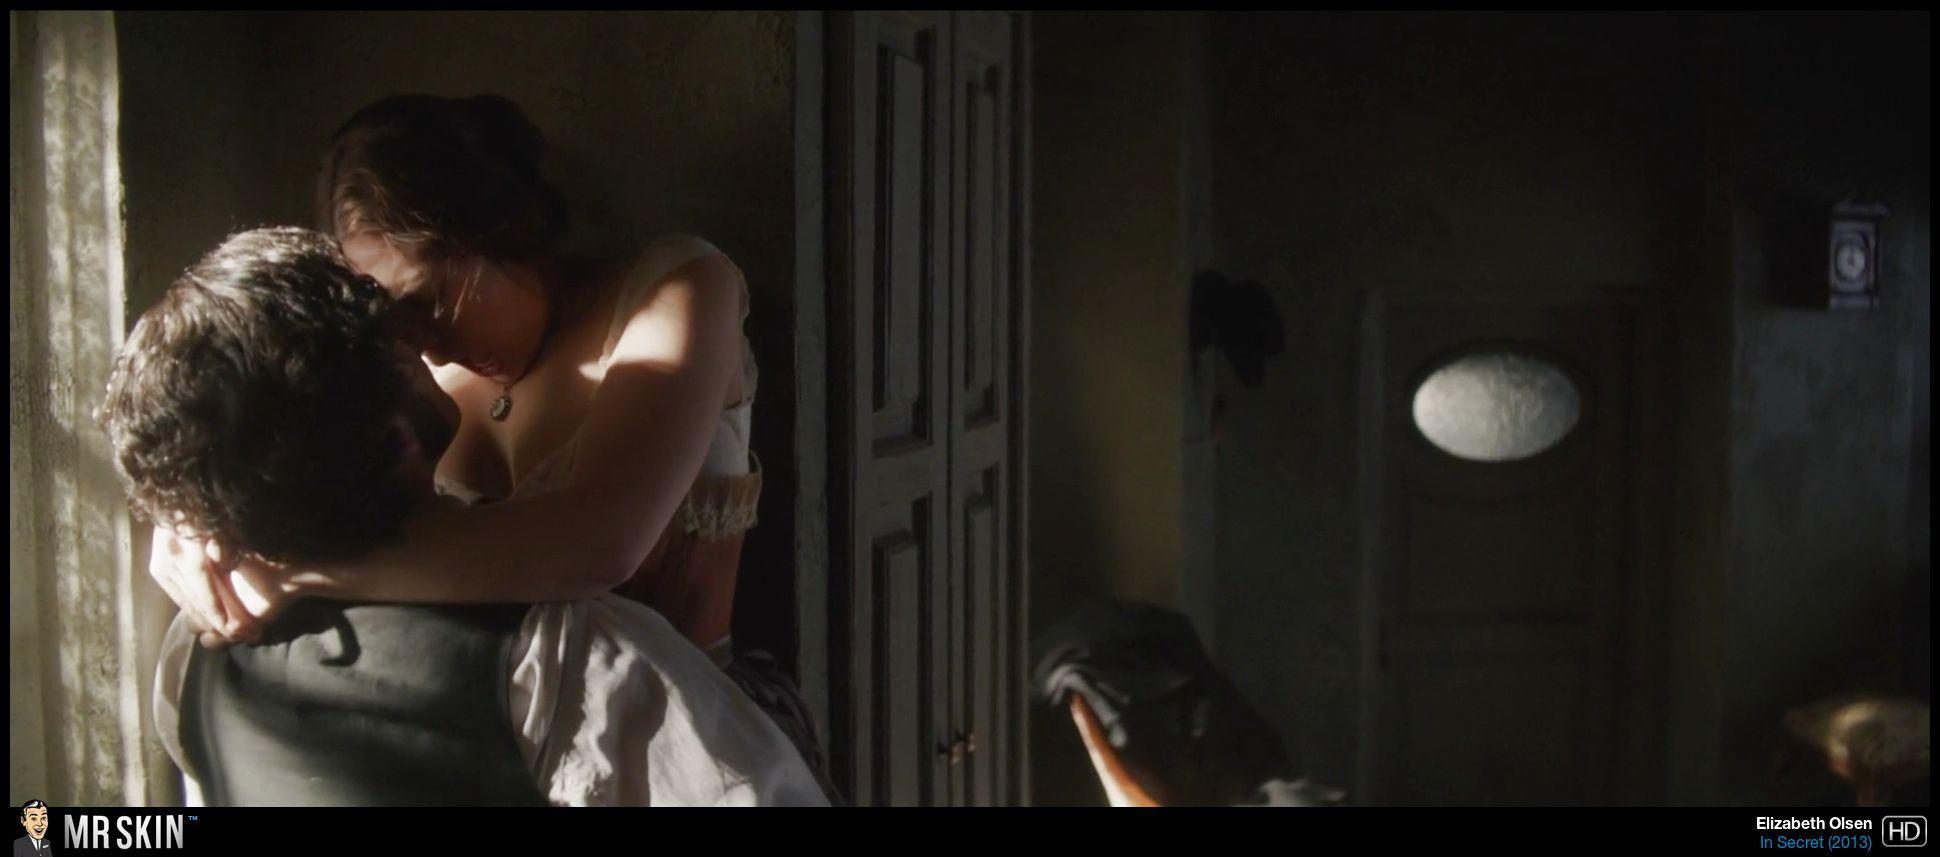 Elizabeth Olsen desnudas